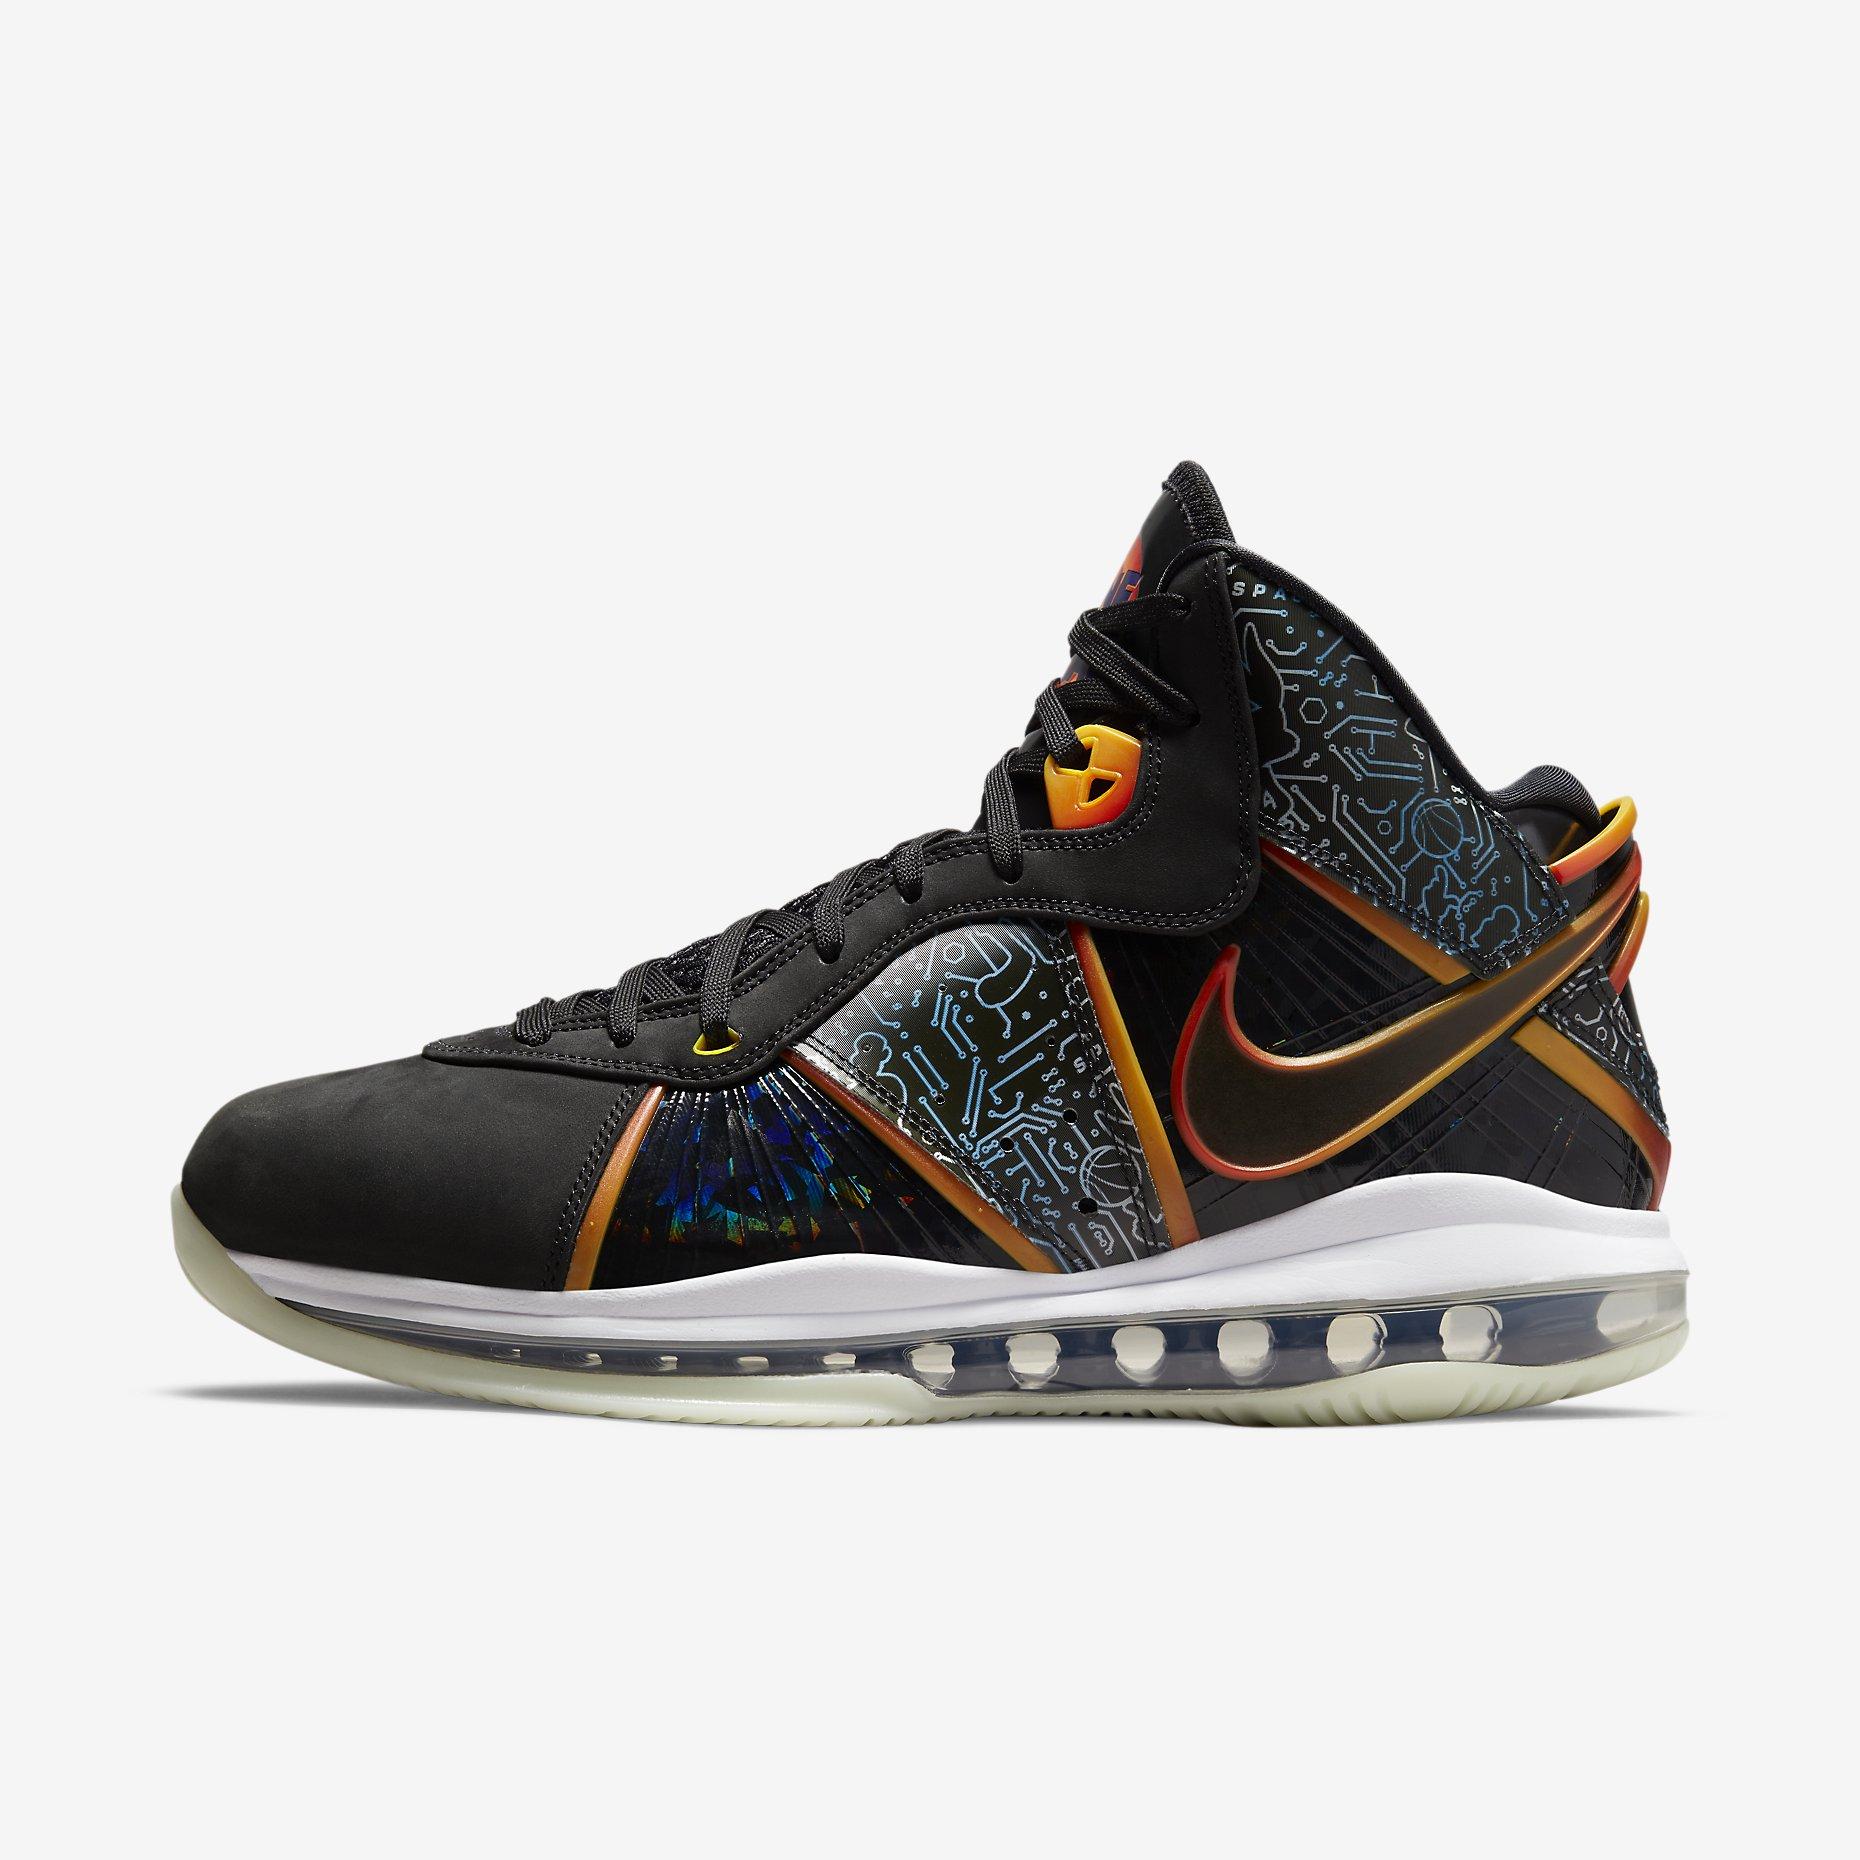 Space Jam x Nike LeBron 8 'A New Legacy'